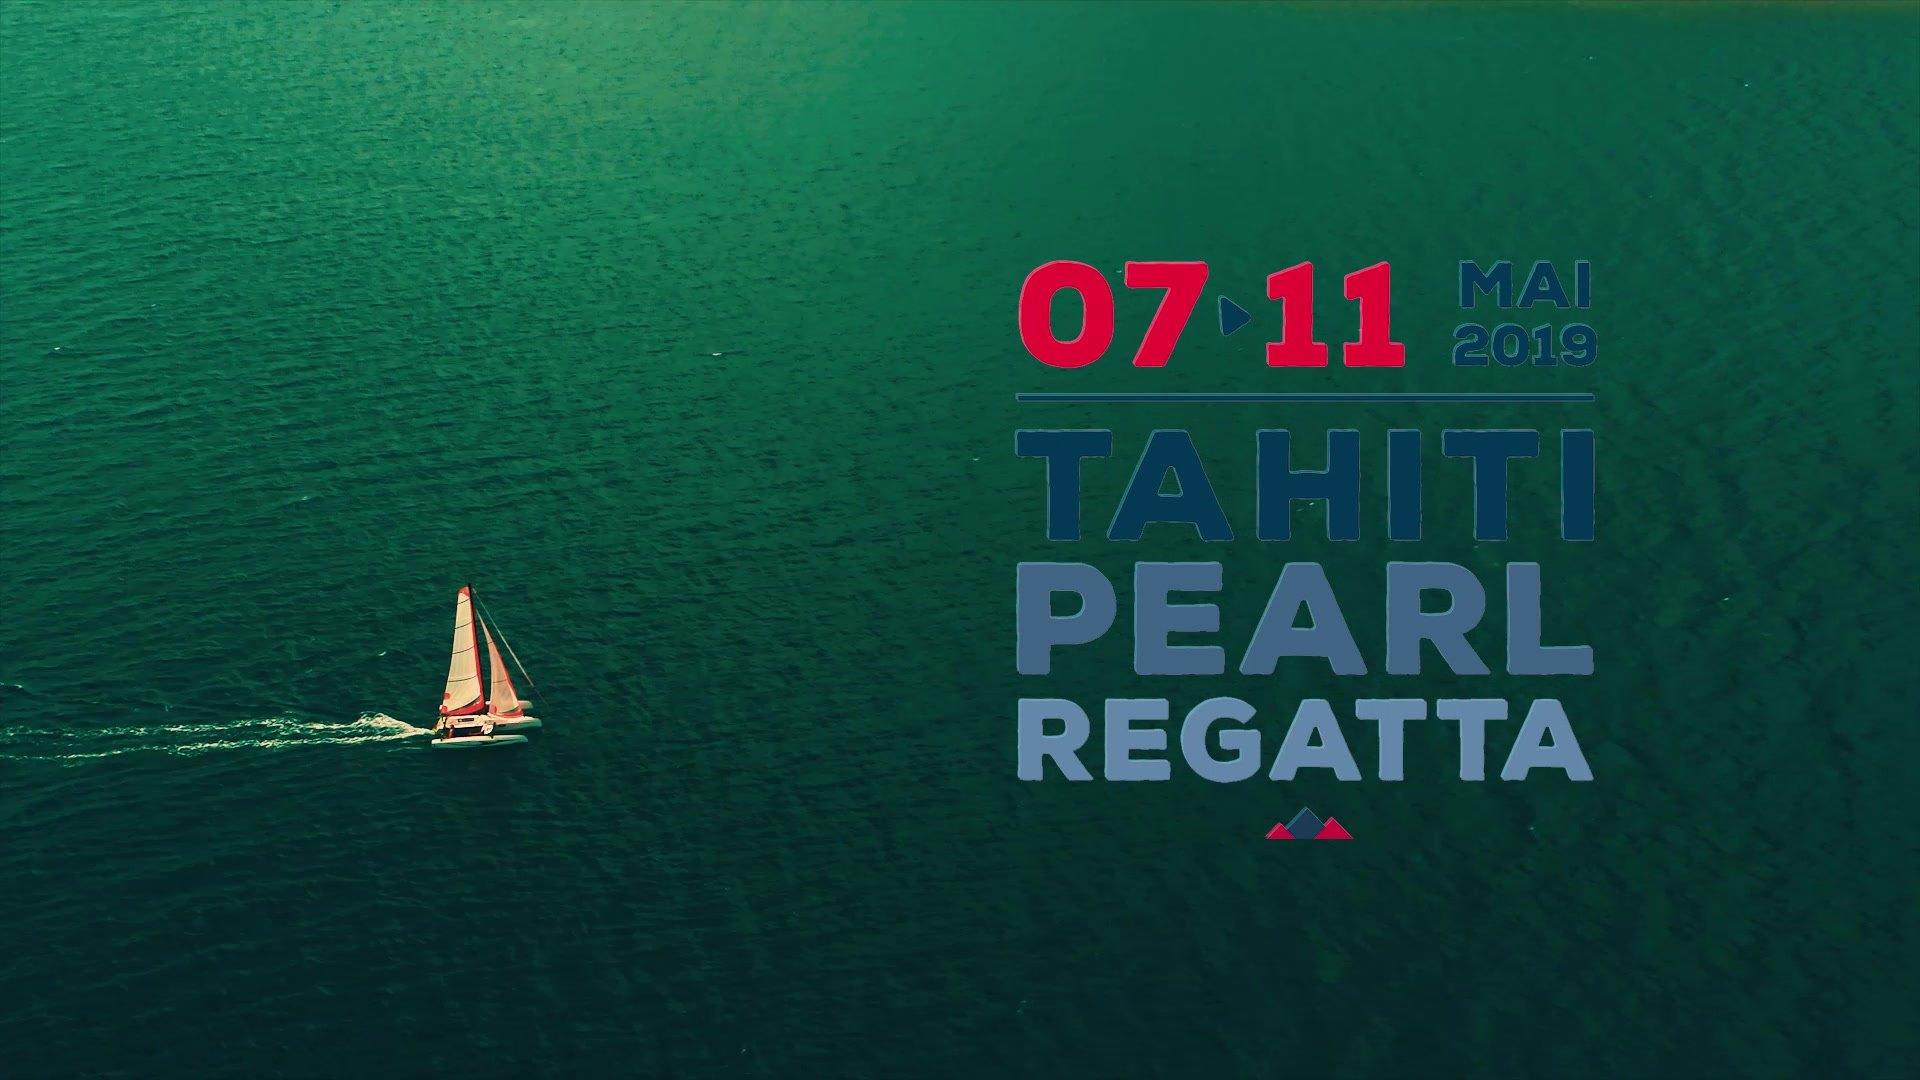 Tahiti Pearl Regatta 2019 - La Tahitian Pearl Race ! CHOC !